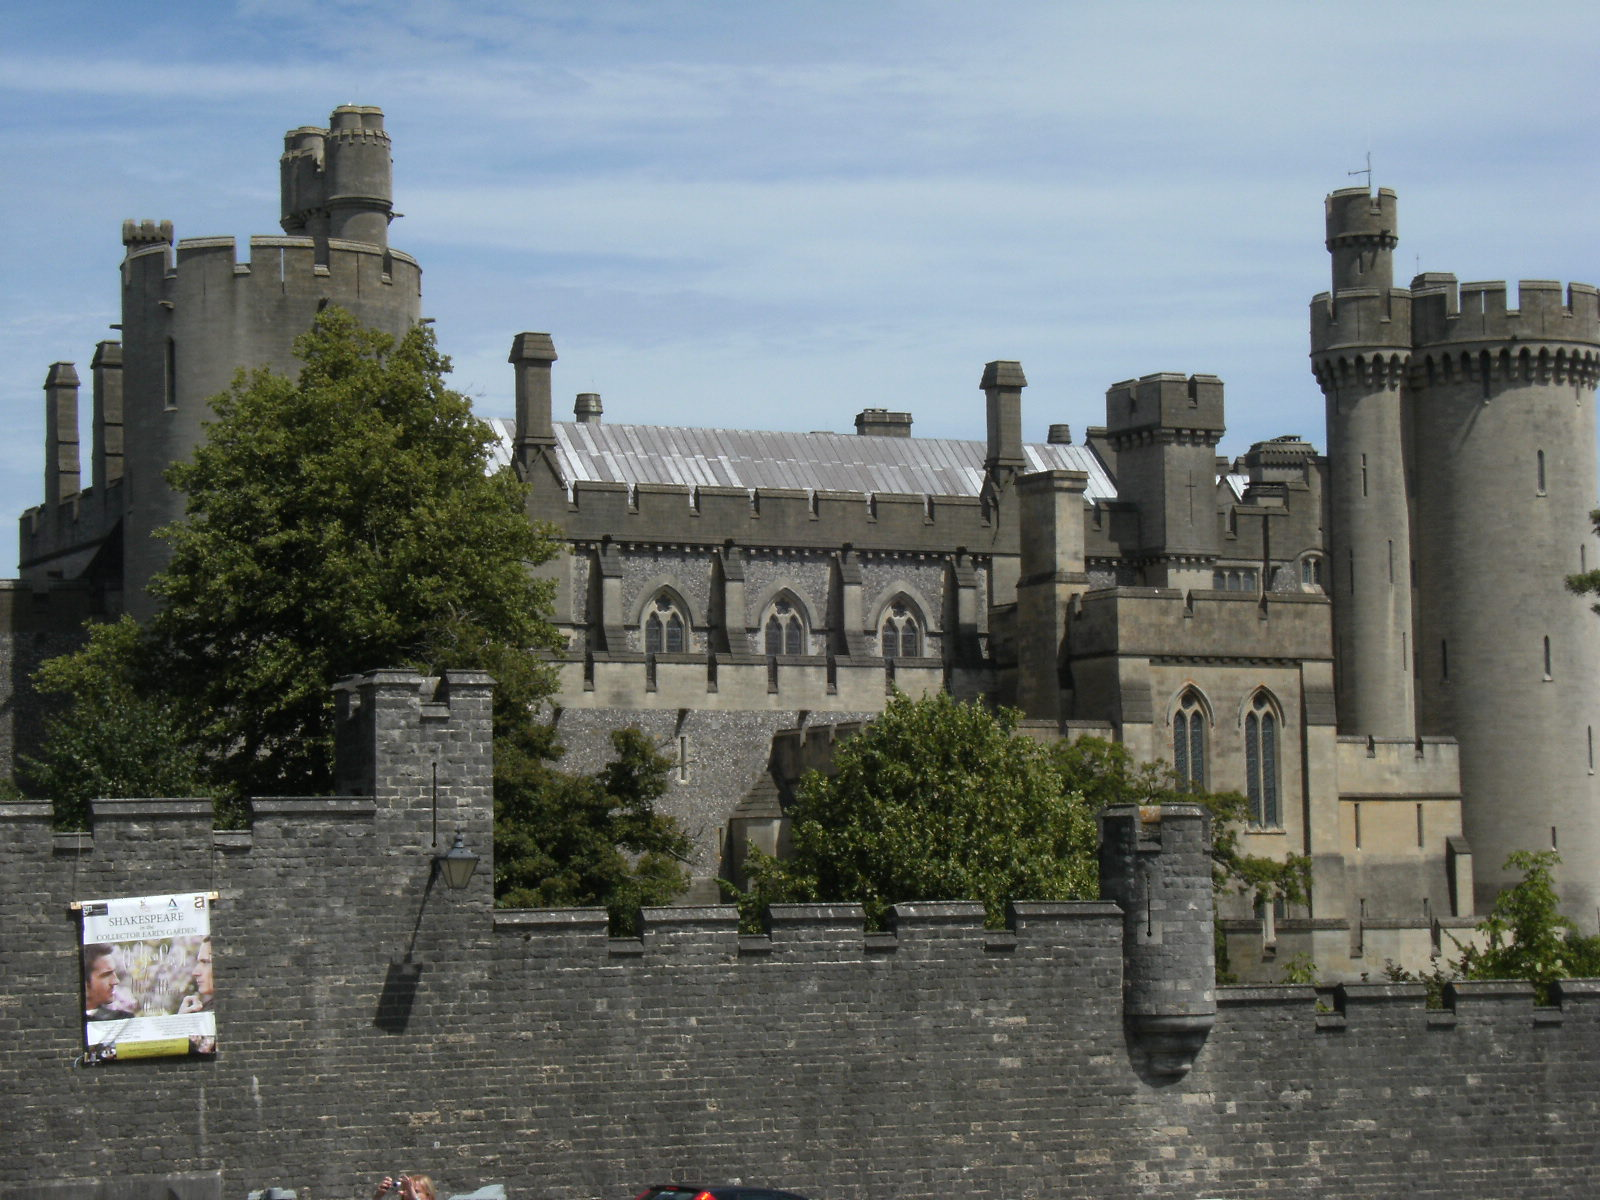 1007190075 Arundel Castle